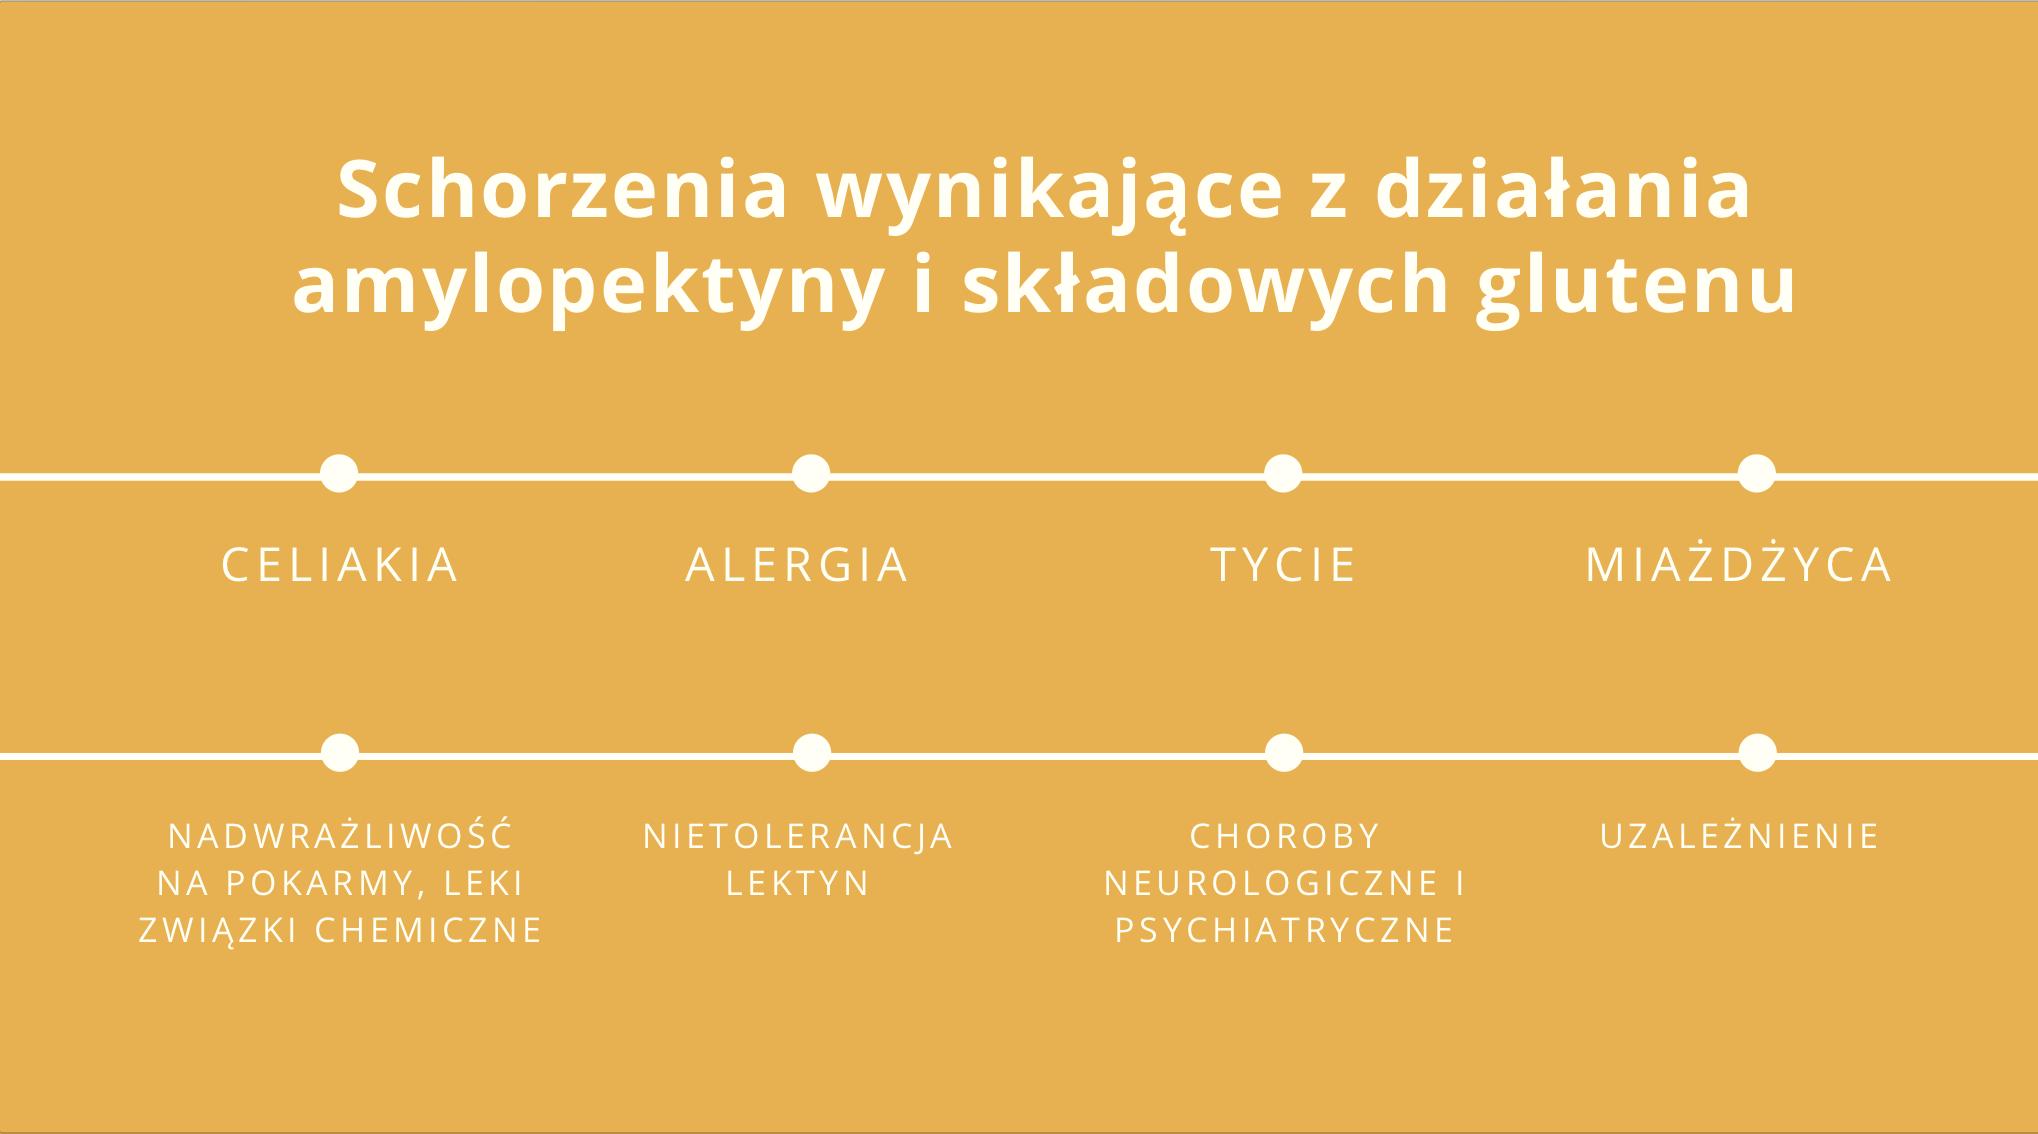 hipoalergiczni-dr-danuta-mylek-pszenica-14